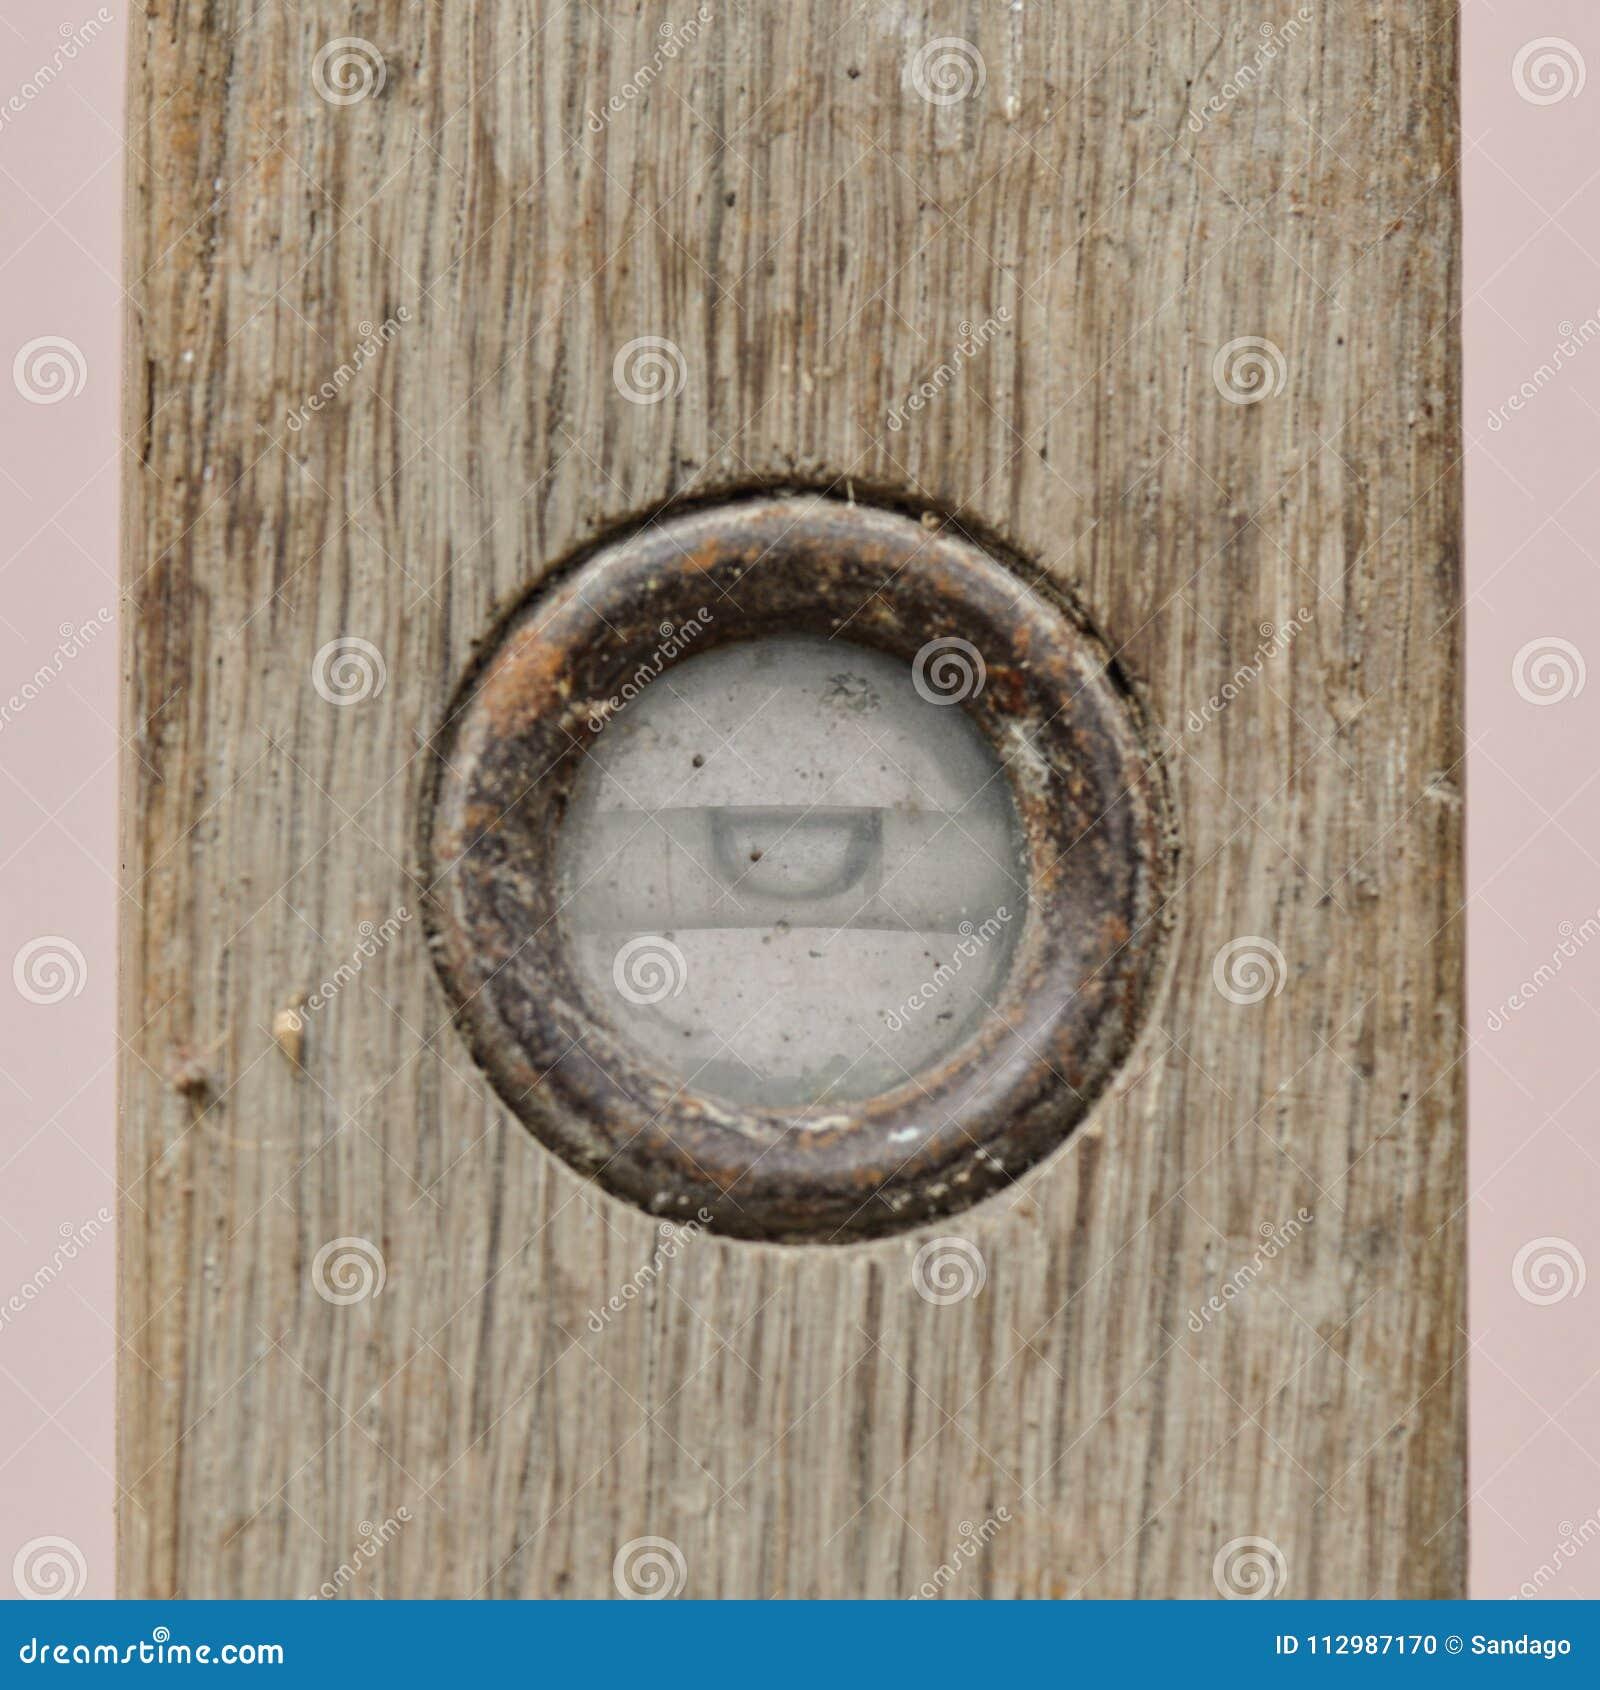 Old spirit level on wooden background